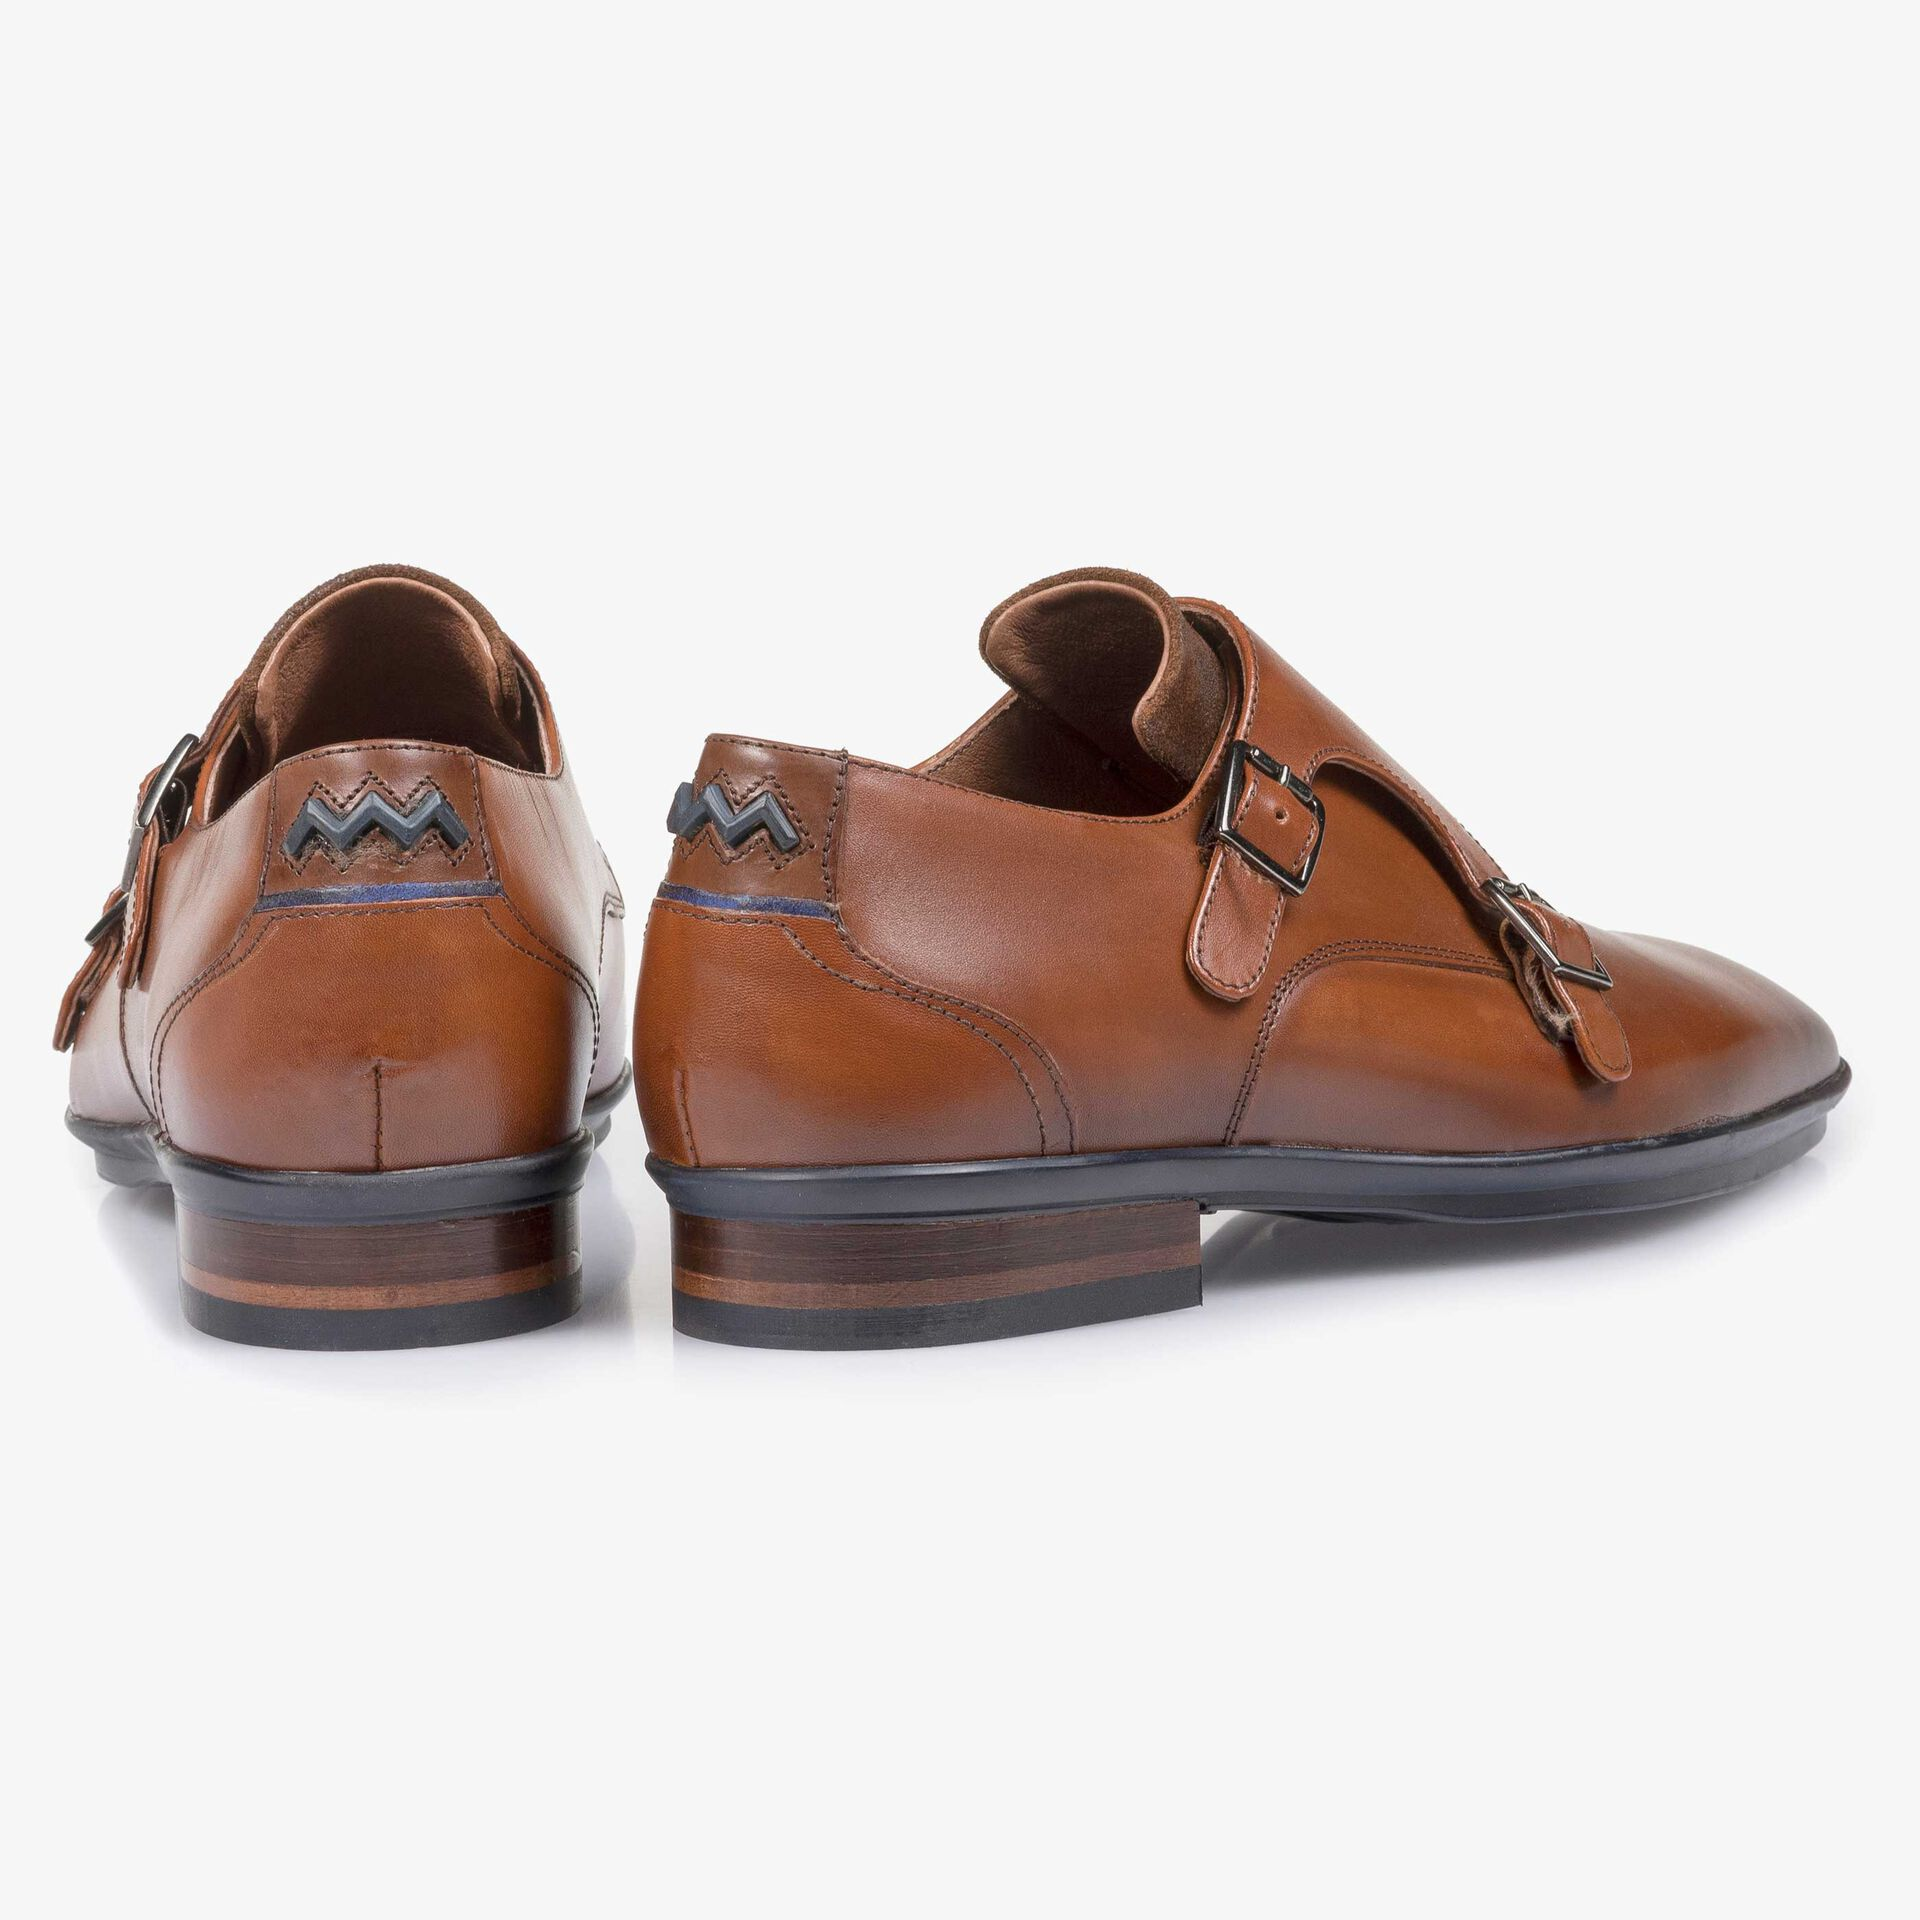 Cognac-coloured calf leather double buckle monk strap